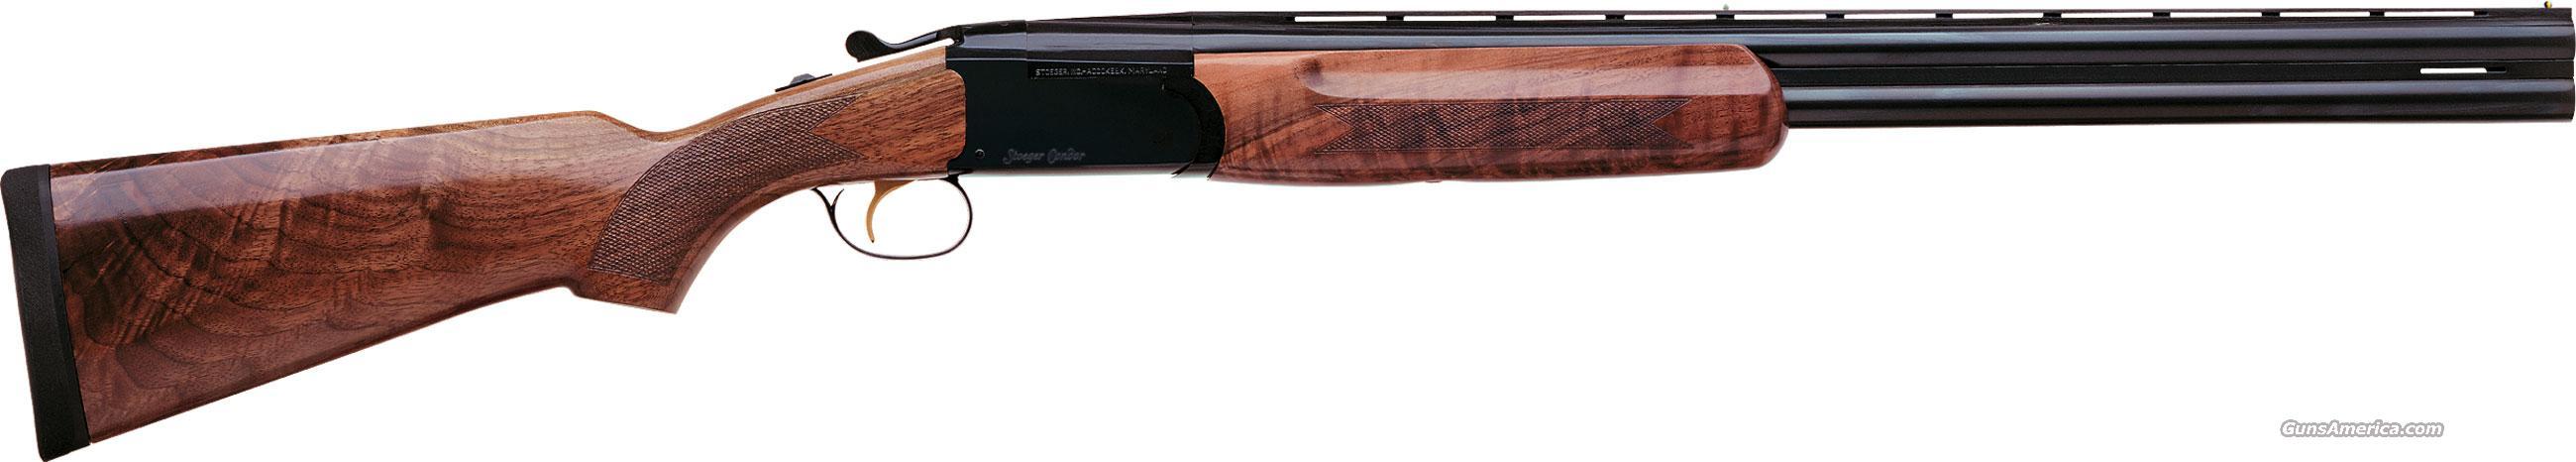 Stoeger Condor Supreme 31015  Guns > Shotguns > Stoeger Shotguns